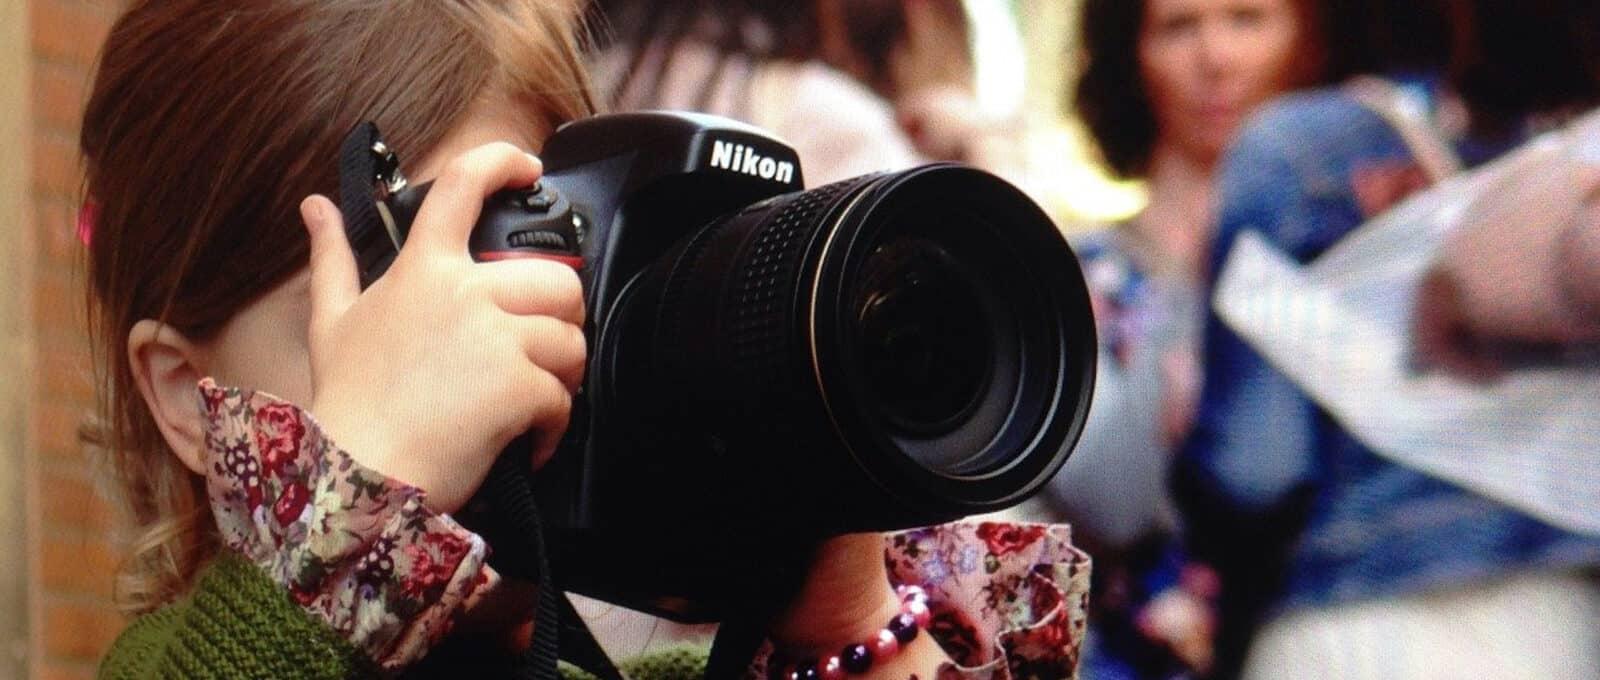 nikon camera little girl